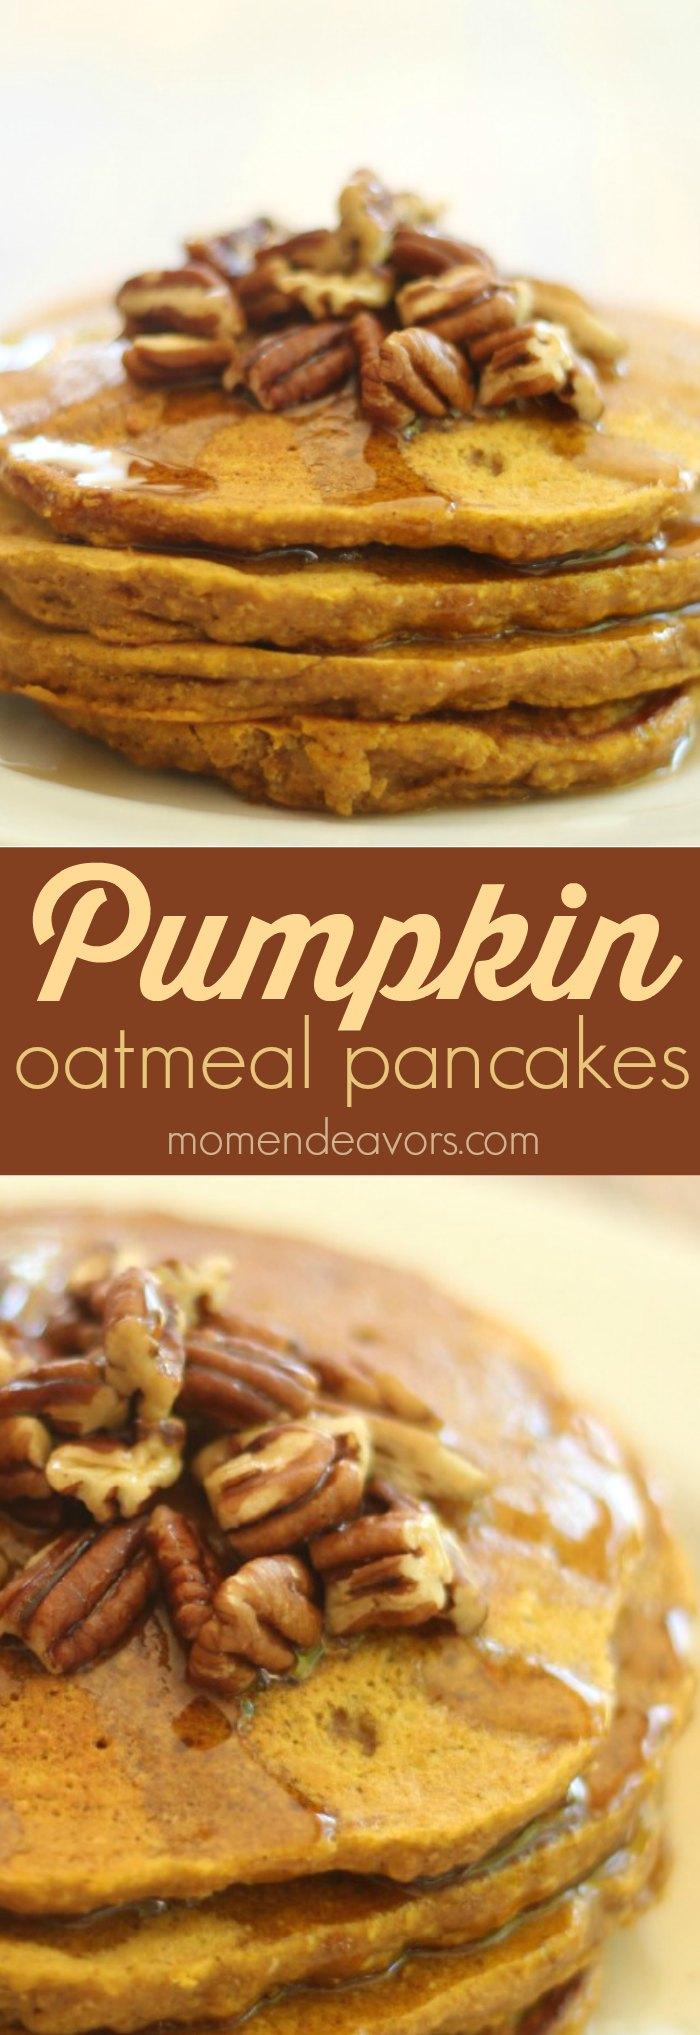 pumpkin-oatmeal-pancakes-recipe